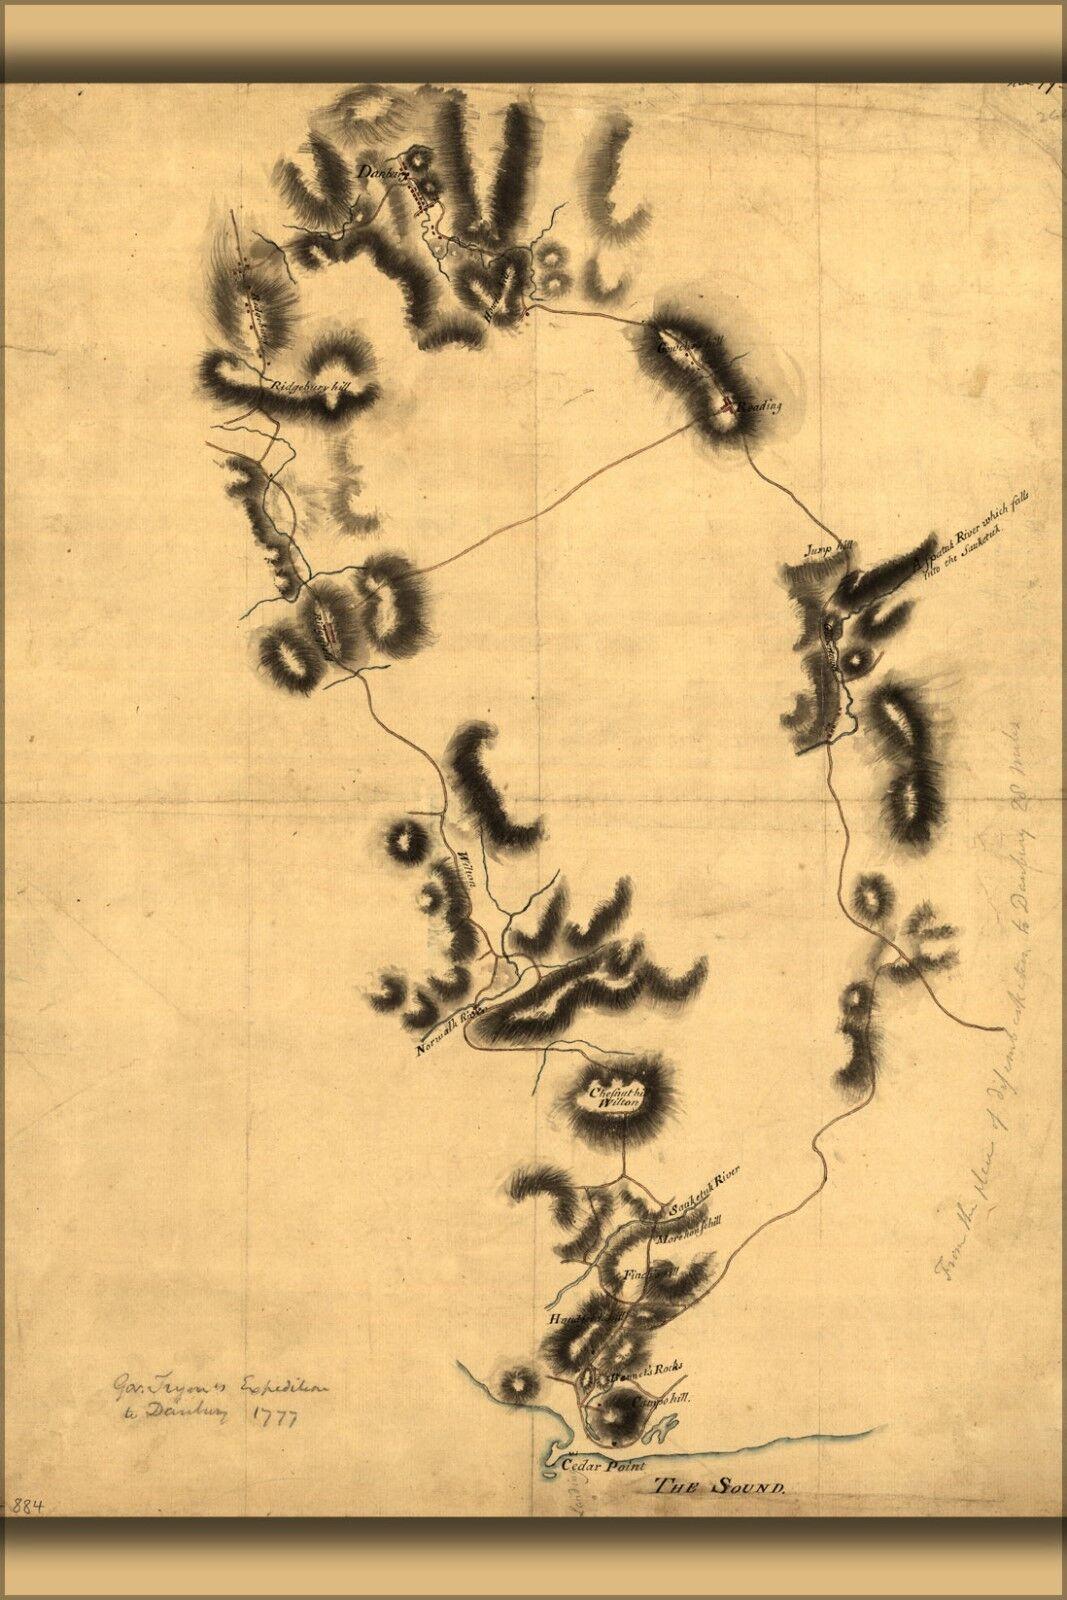 Plakat, Viele Größen; Gov.Tryons Expedition Danbury Connecticut 1777